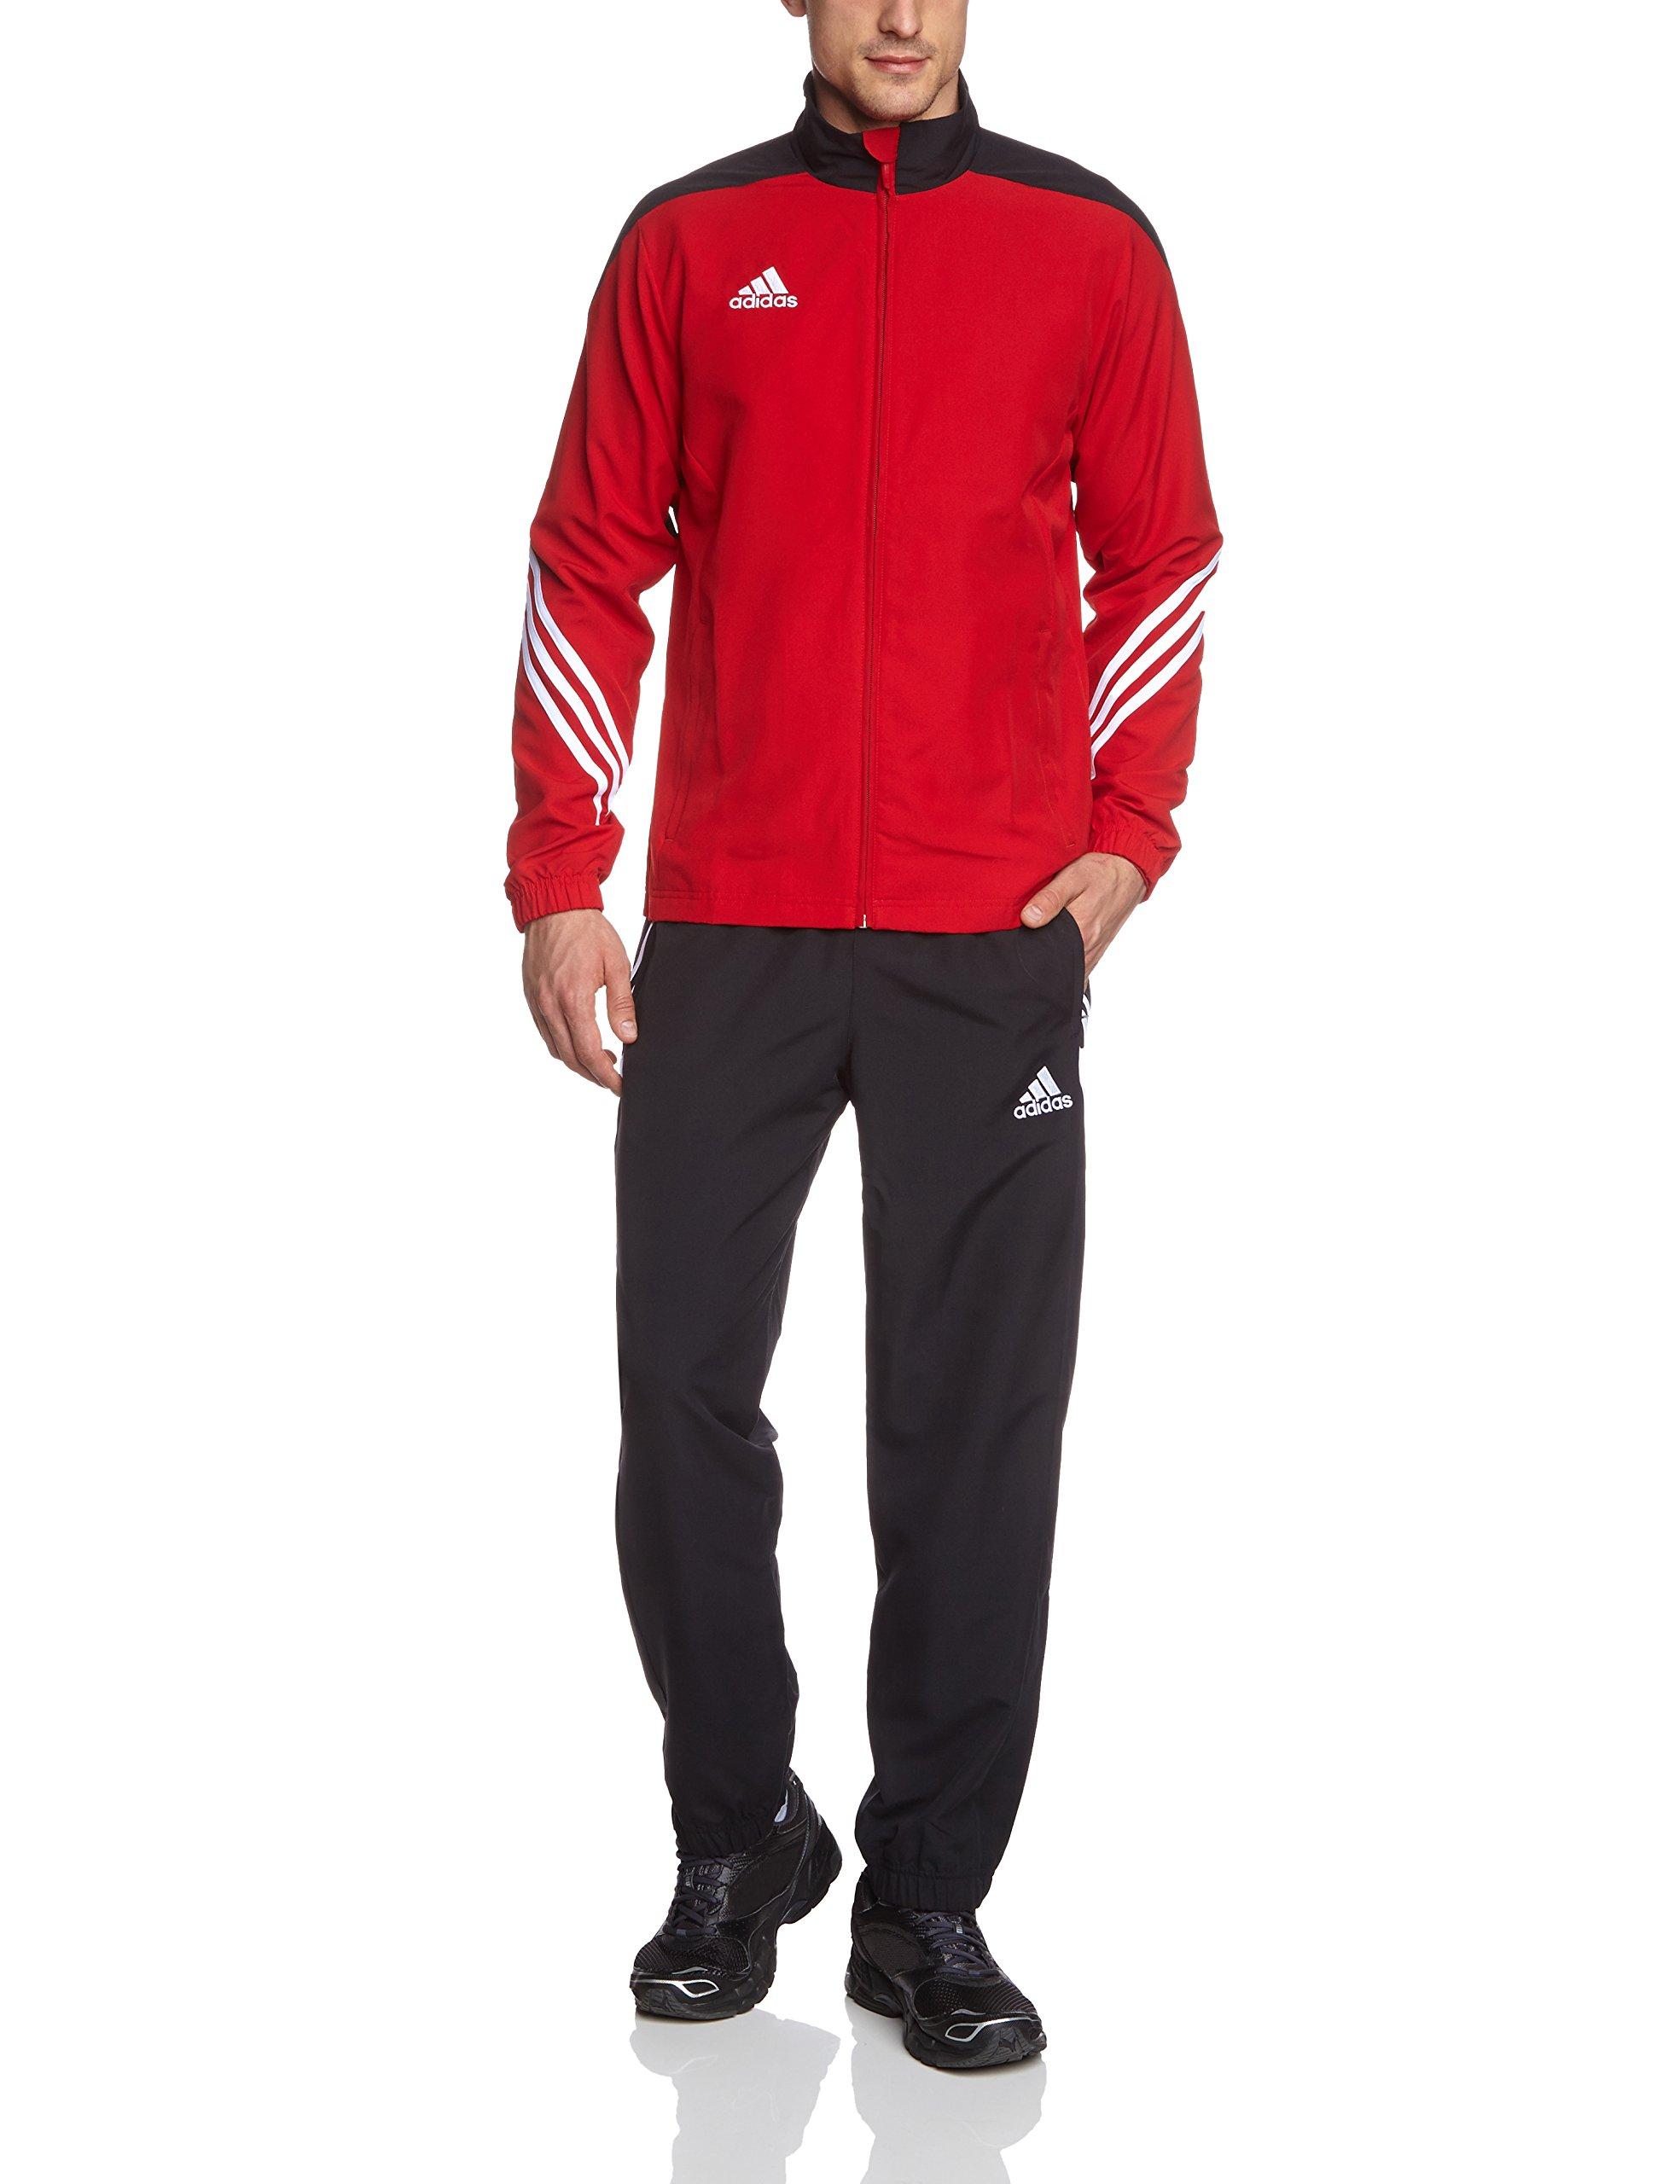 buy popular a34a2 08e6a adidas Sere14 PRE Suit - Chándal de fútbol para hombre, color rojo negro